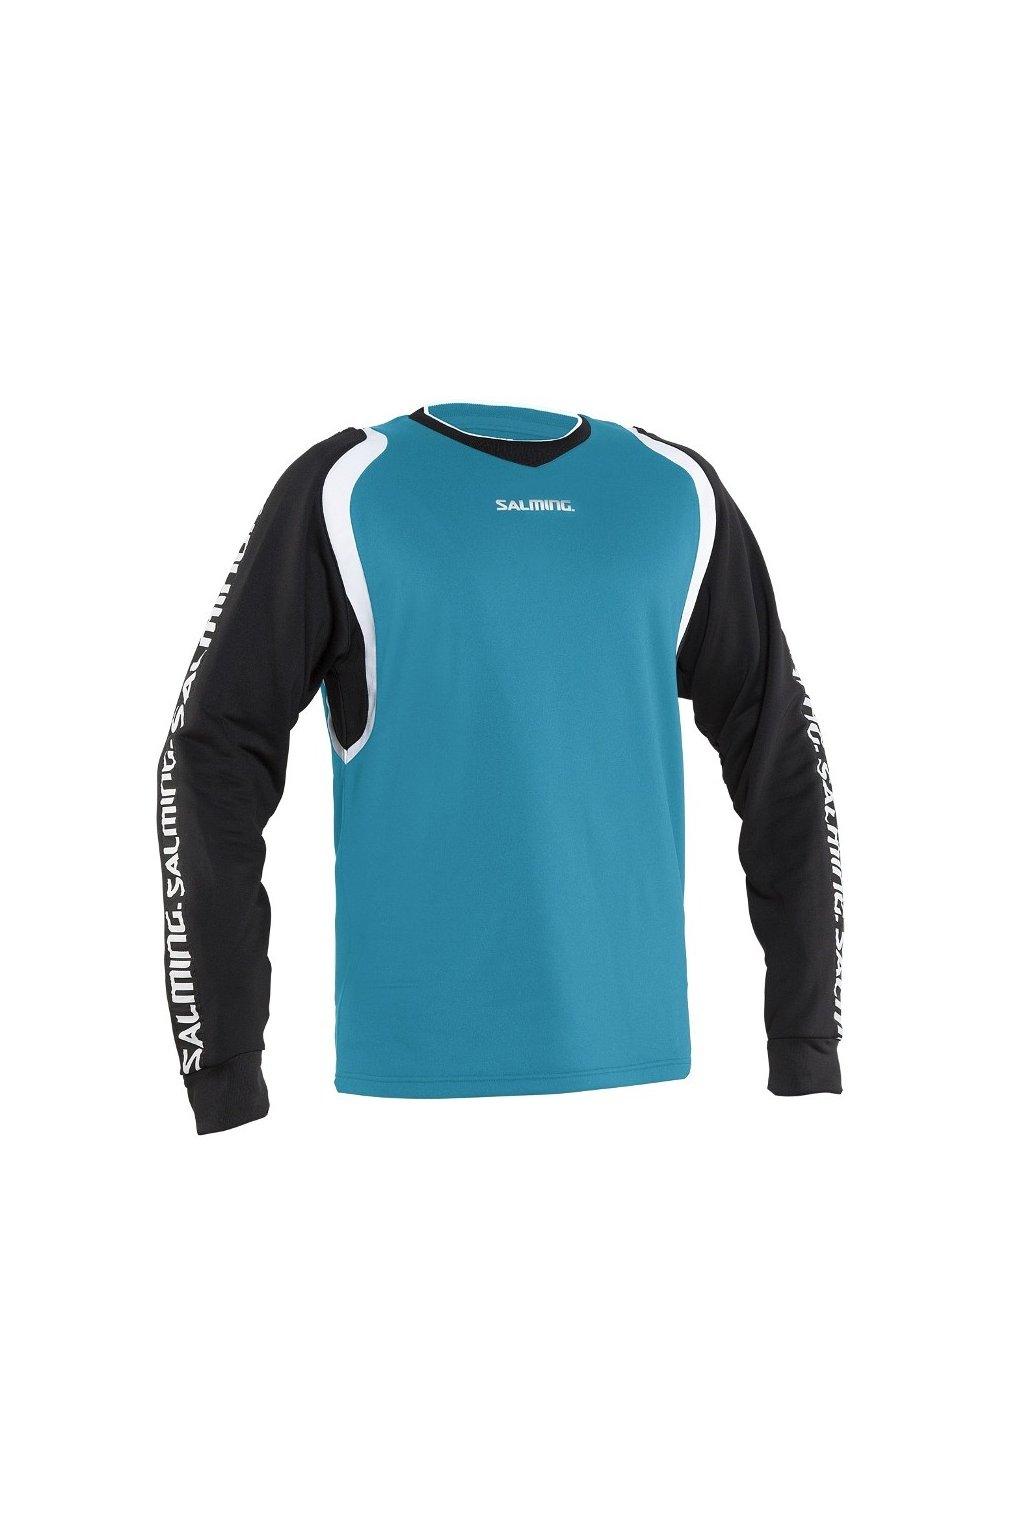 salming agon ls jersey (2)